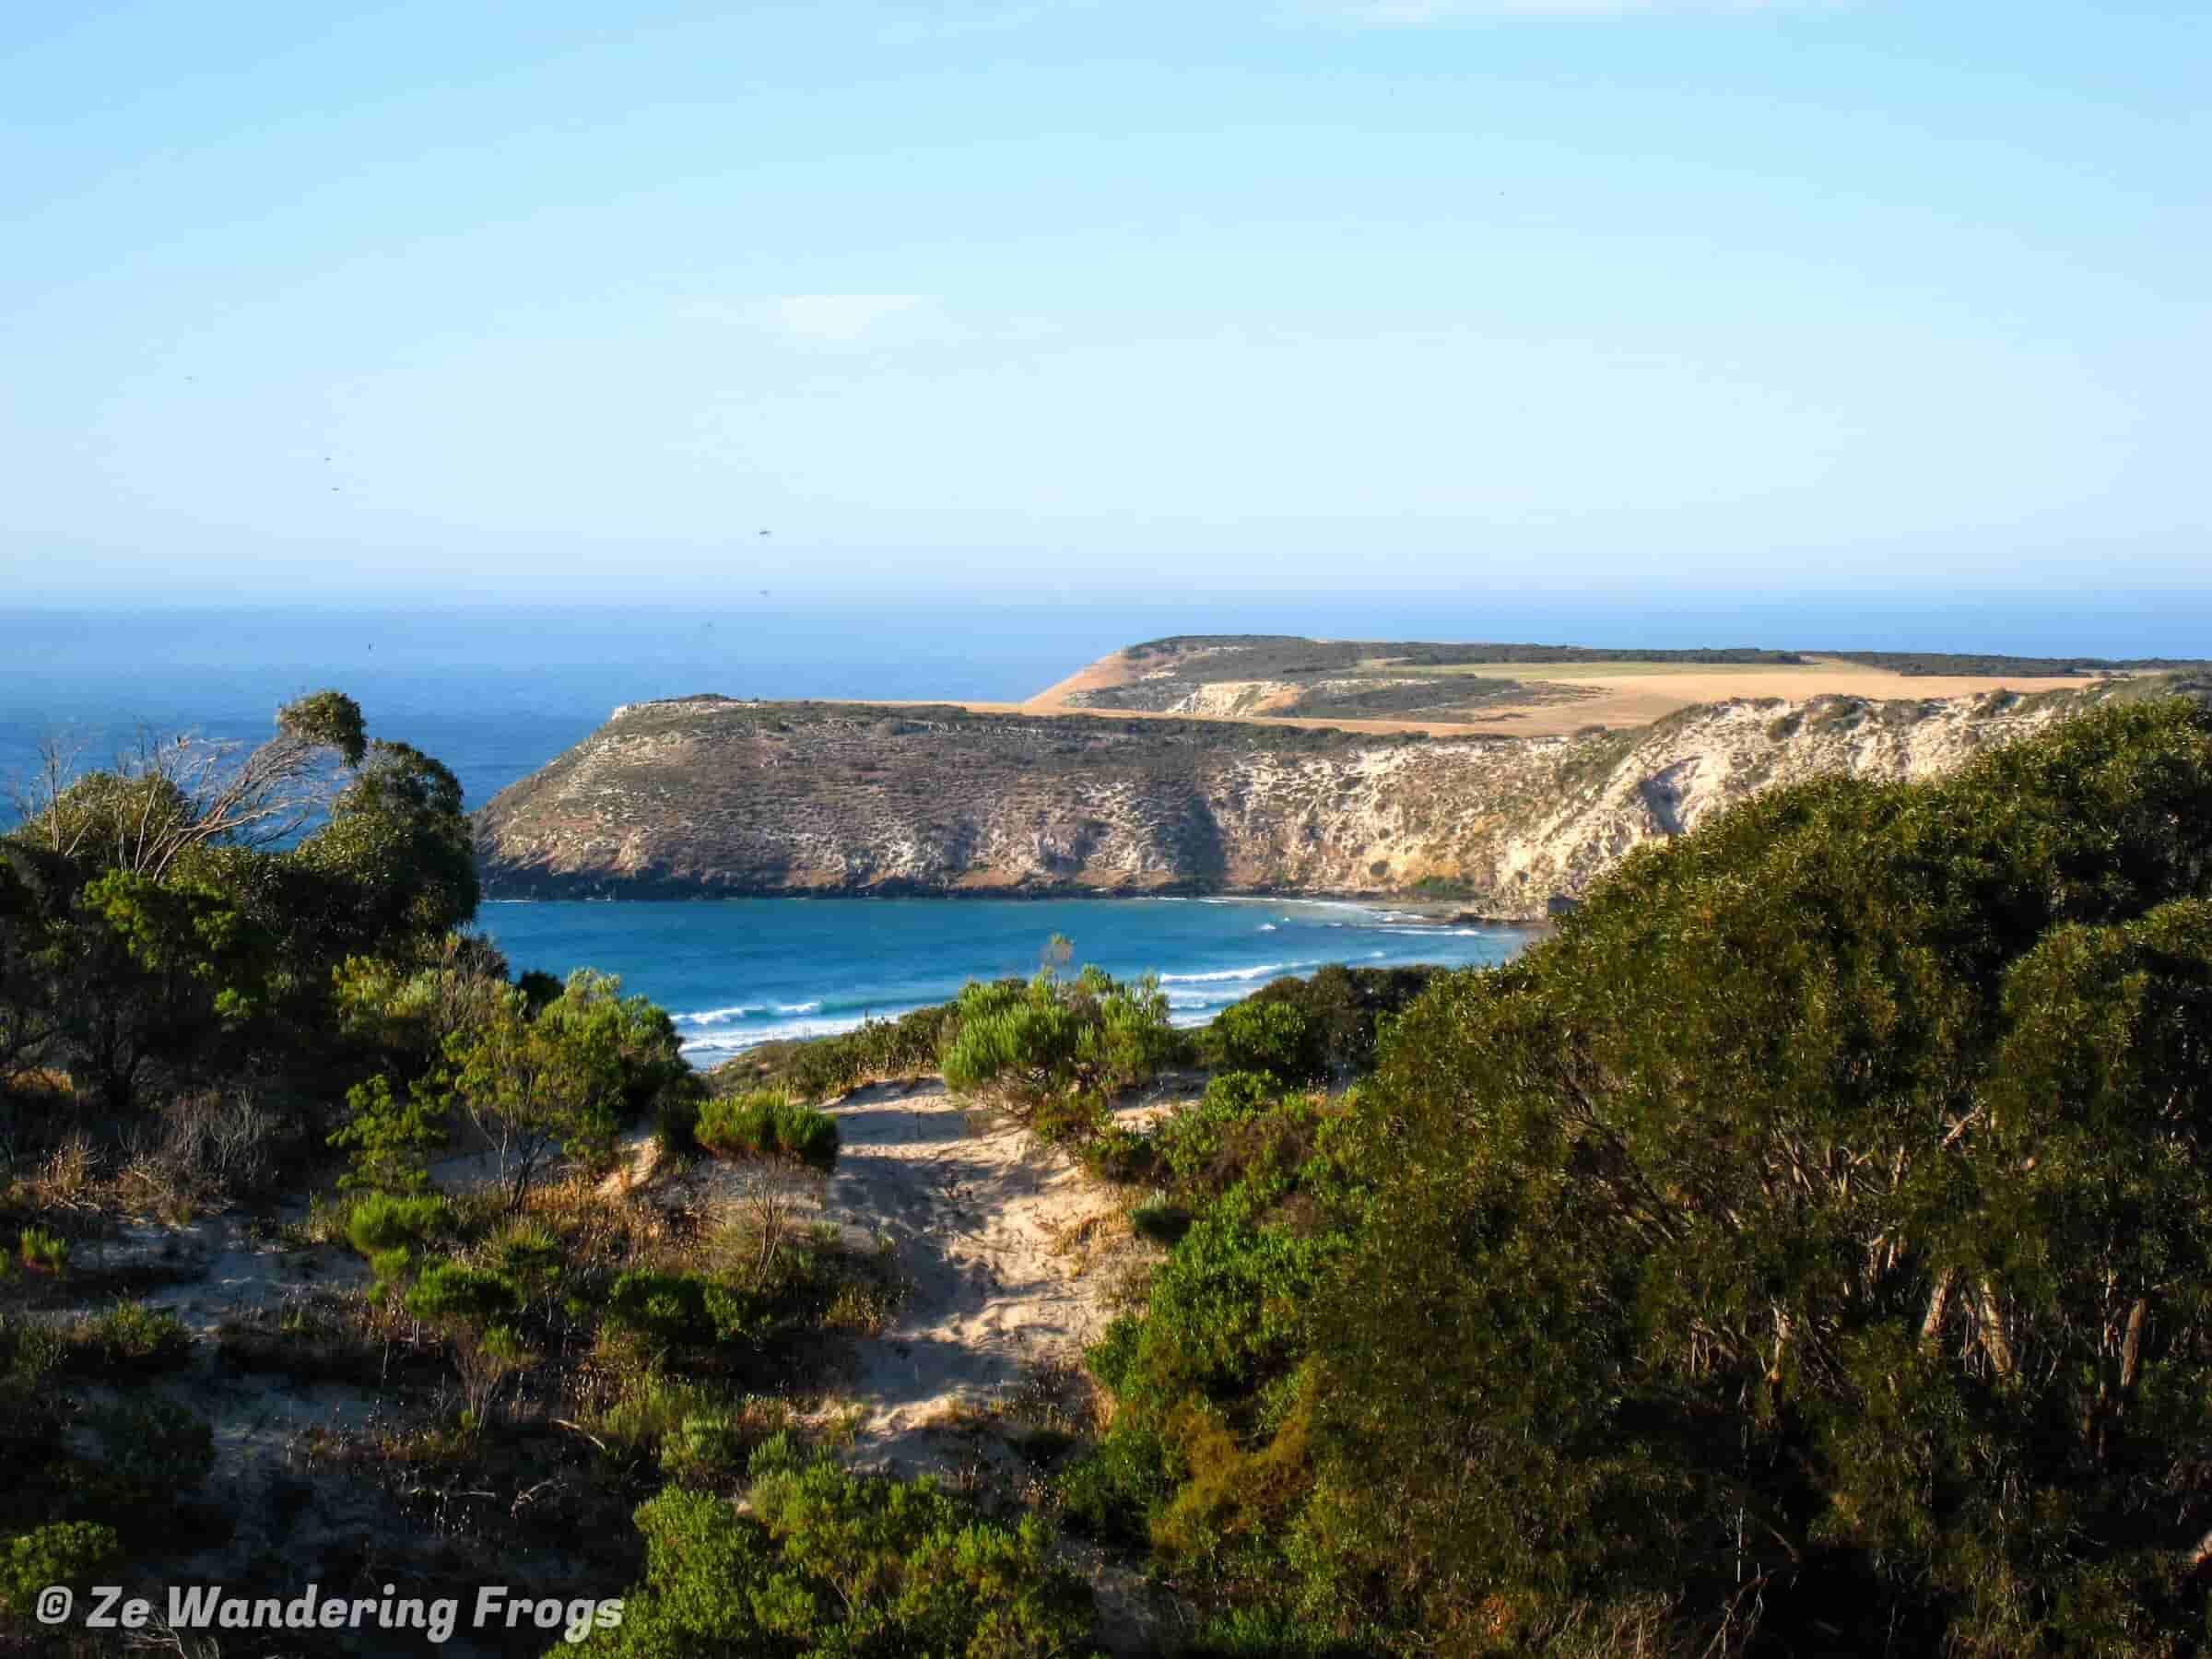 Beautiful View Of The Kangaroo Island